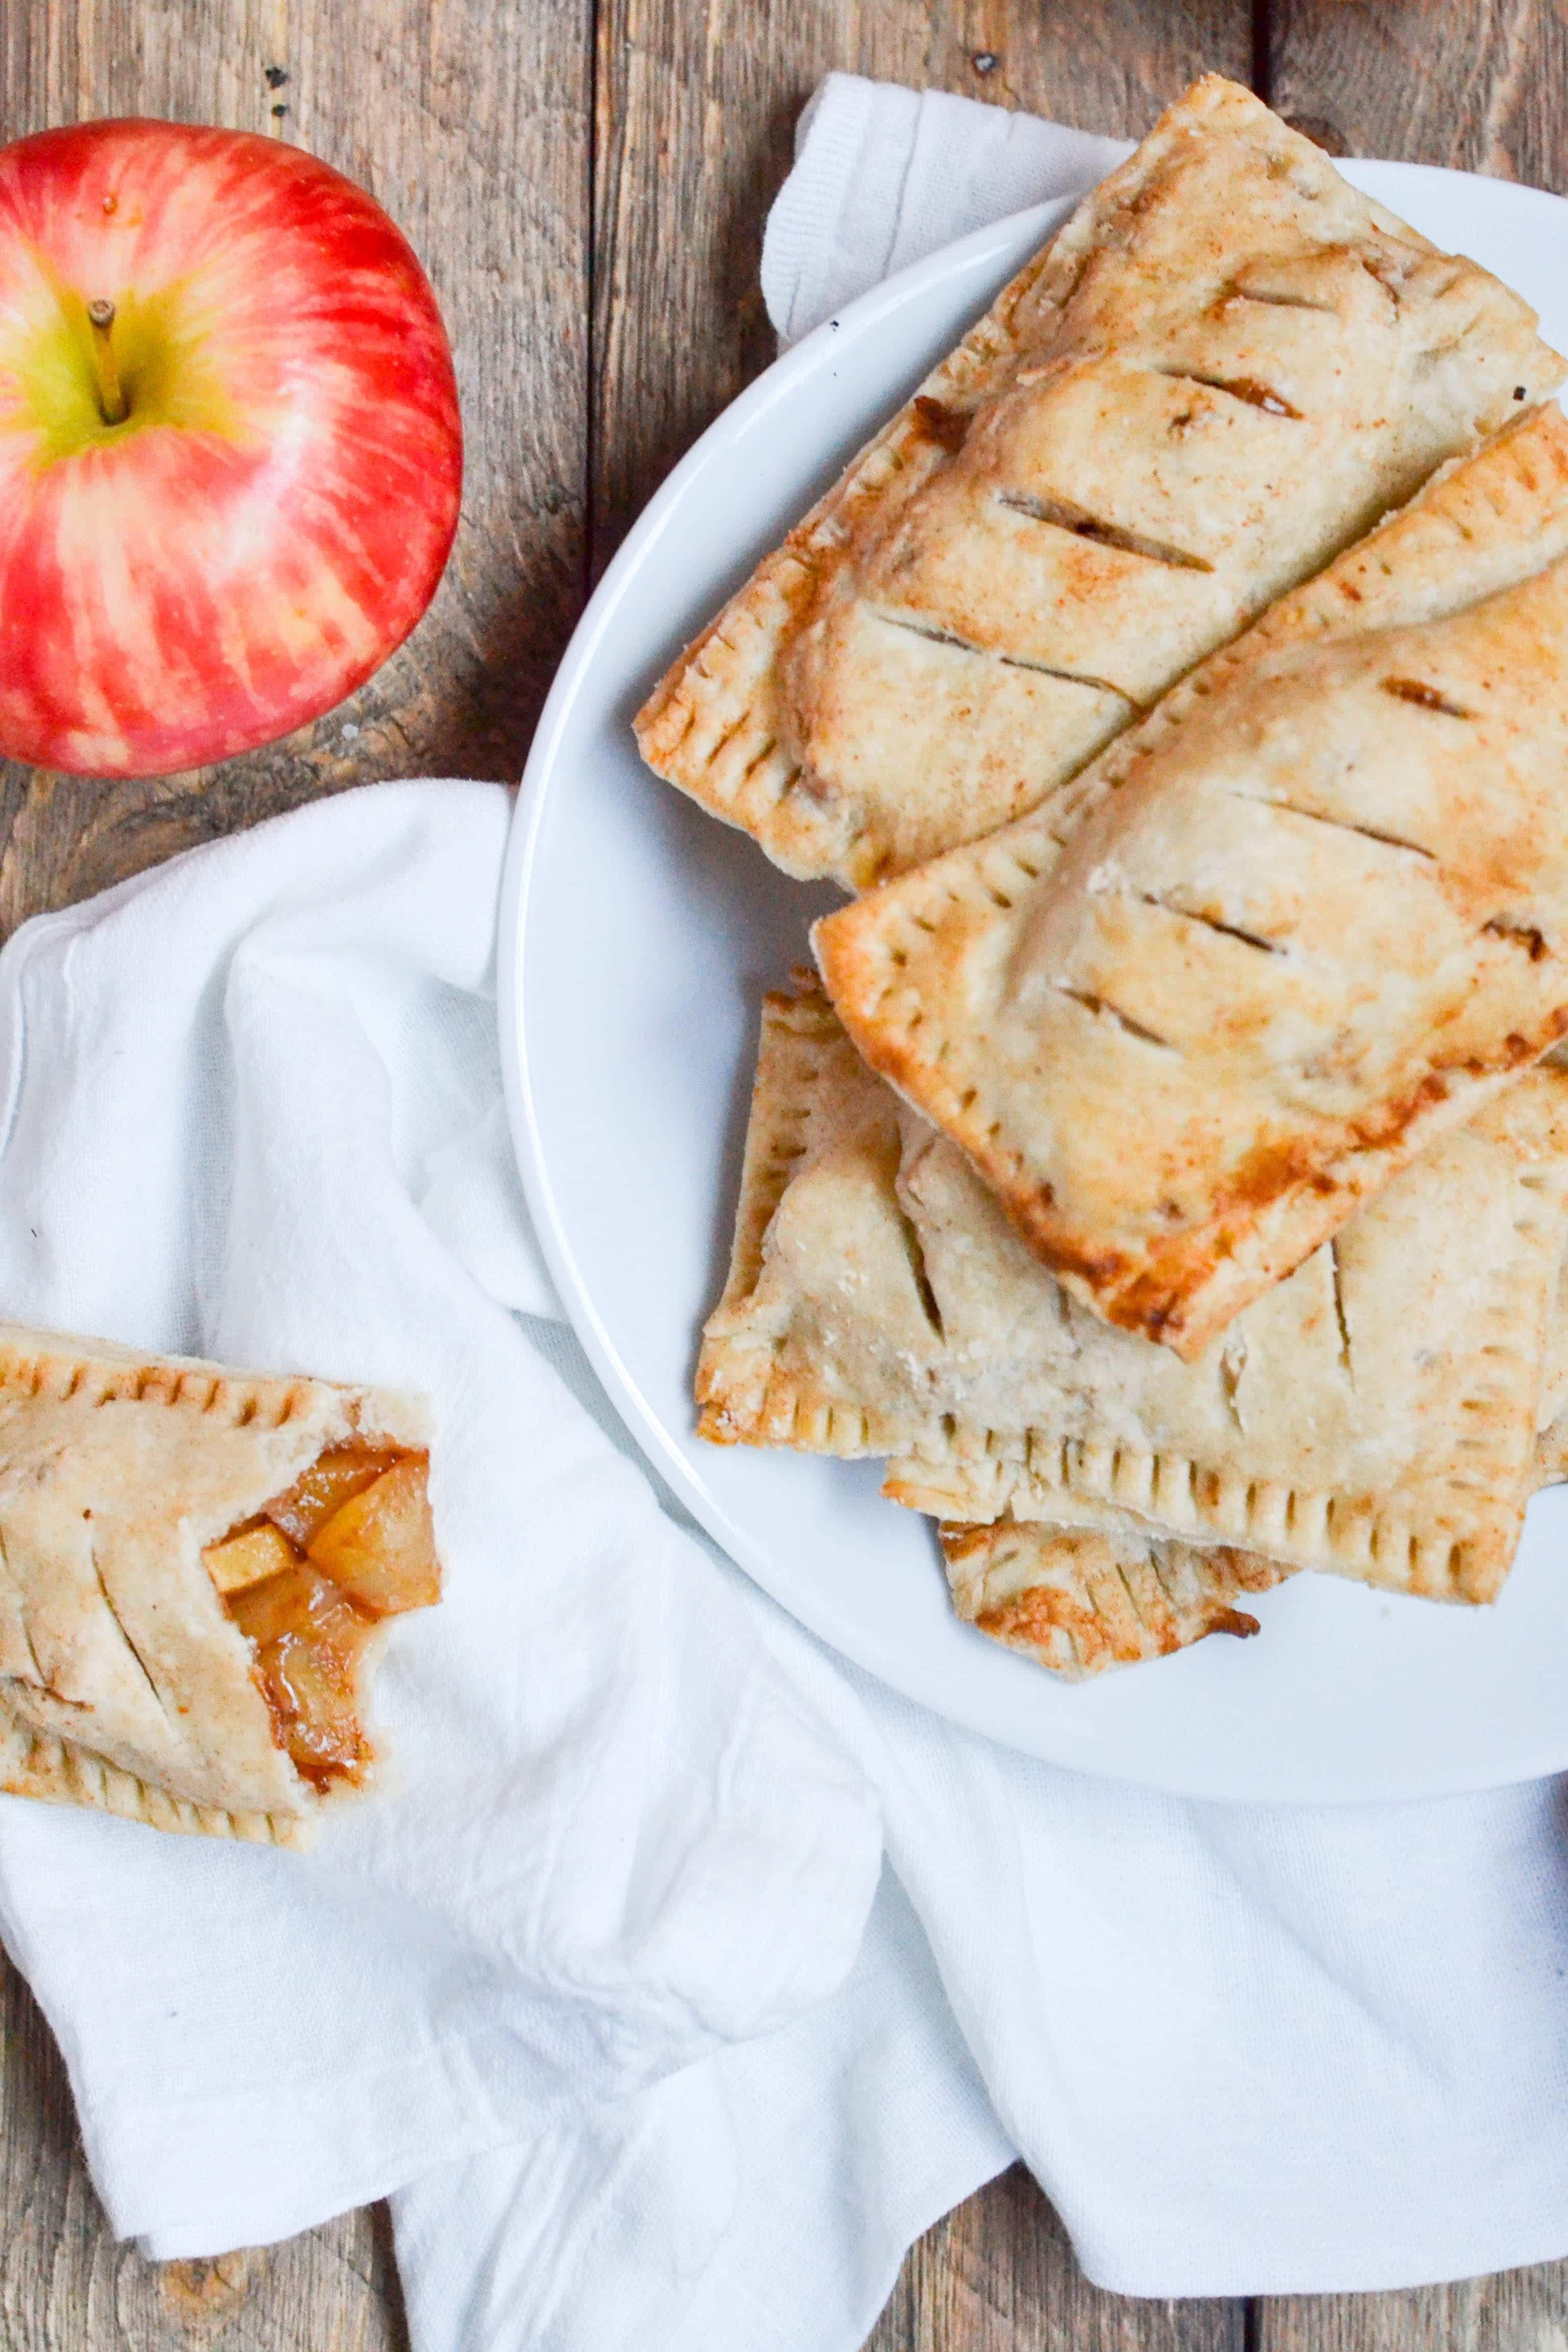 Gluten-Free Vegan Apple Hand Pies (GF, DF, V) - A Dash of Megnut